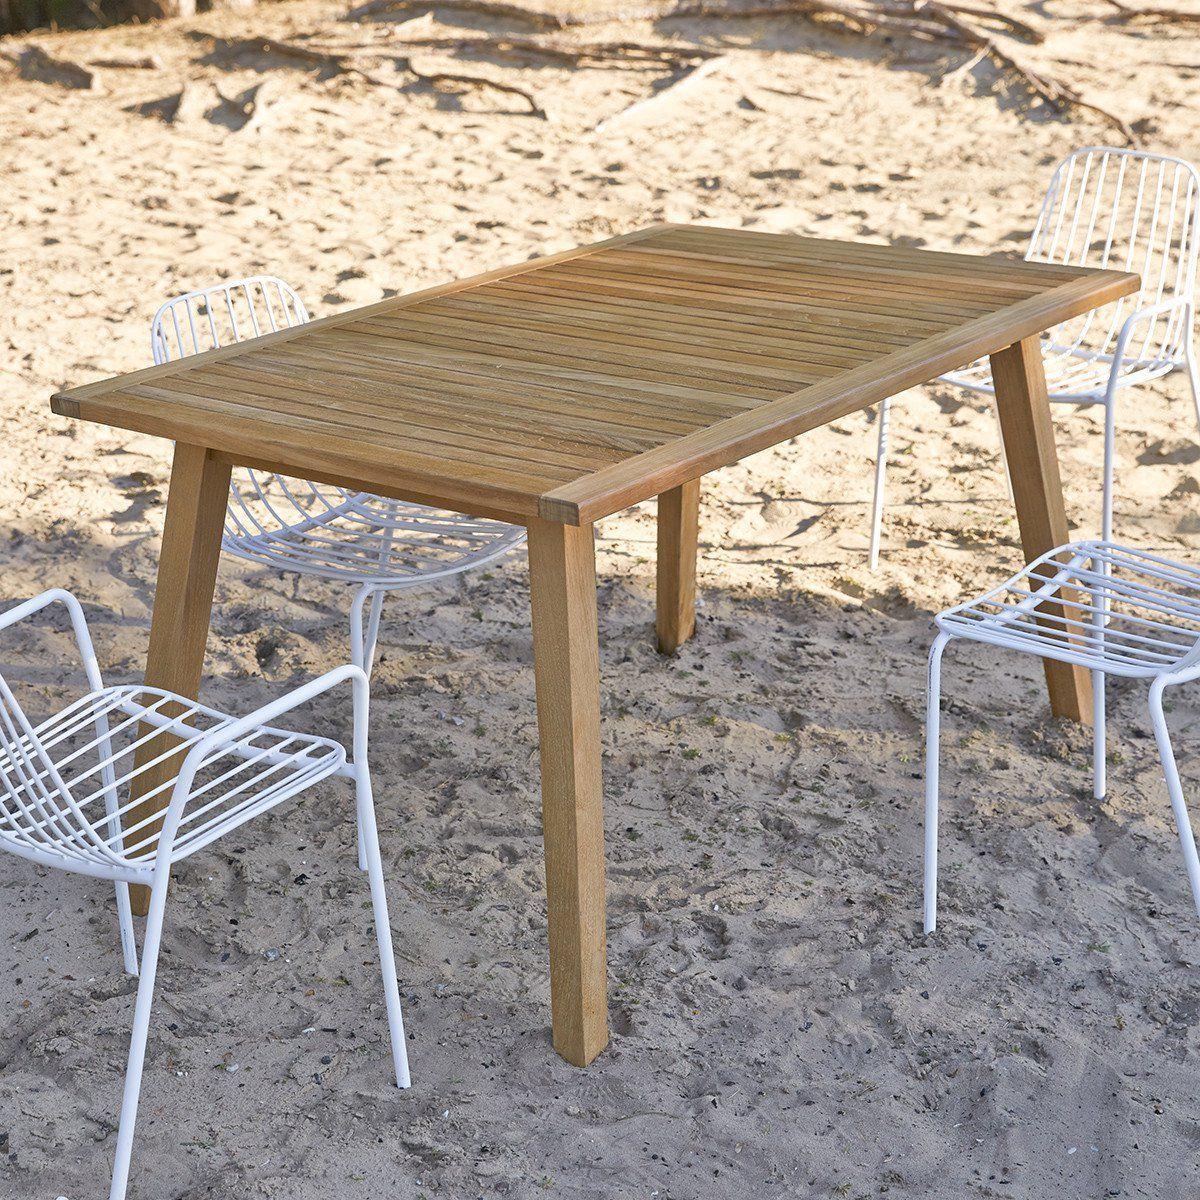 Table De Jardin En Bois De Teck 140 Pamoa - Taille : Taille ...